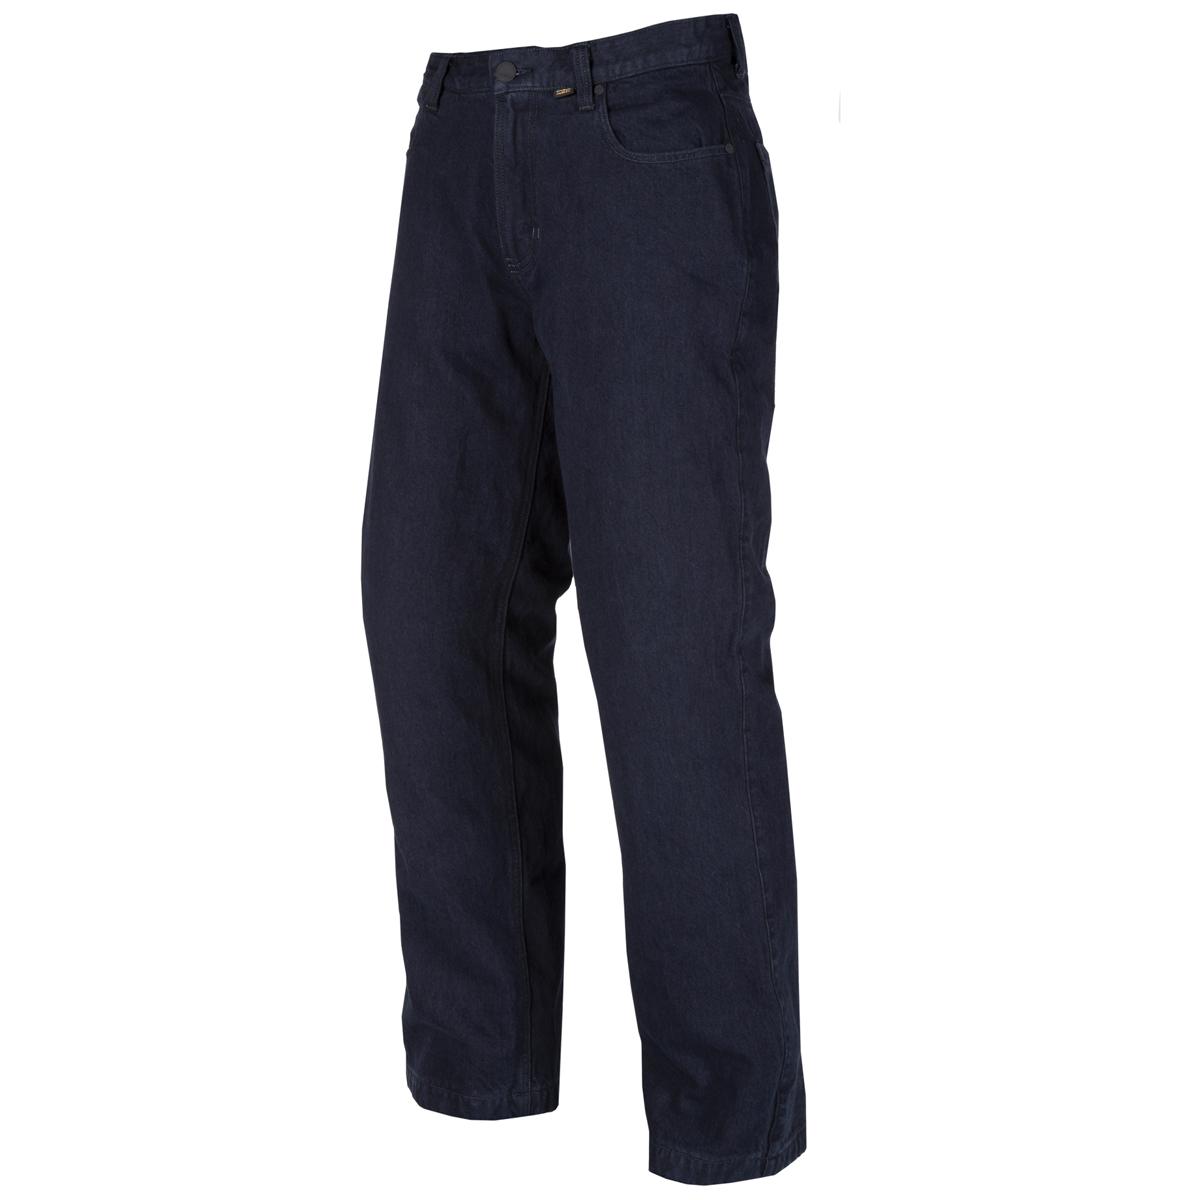 Klim Men's K Fifty 2 Stealth Blue Riding Jeans